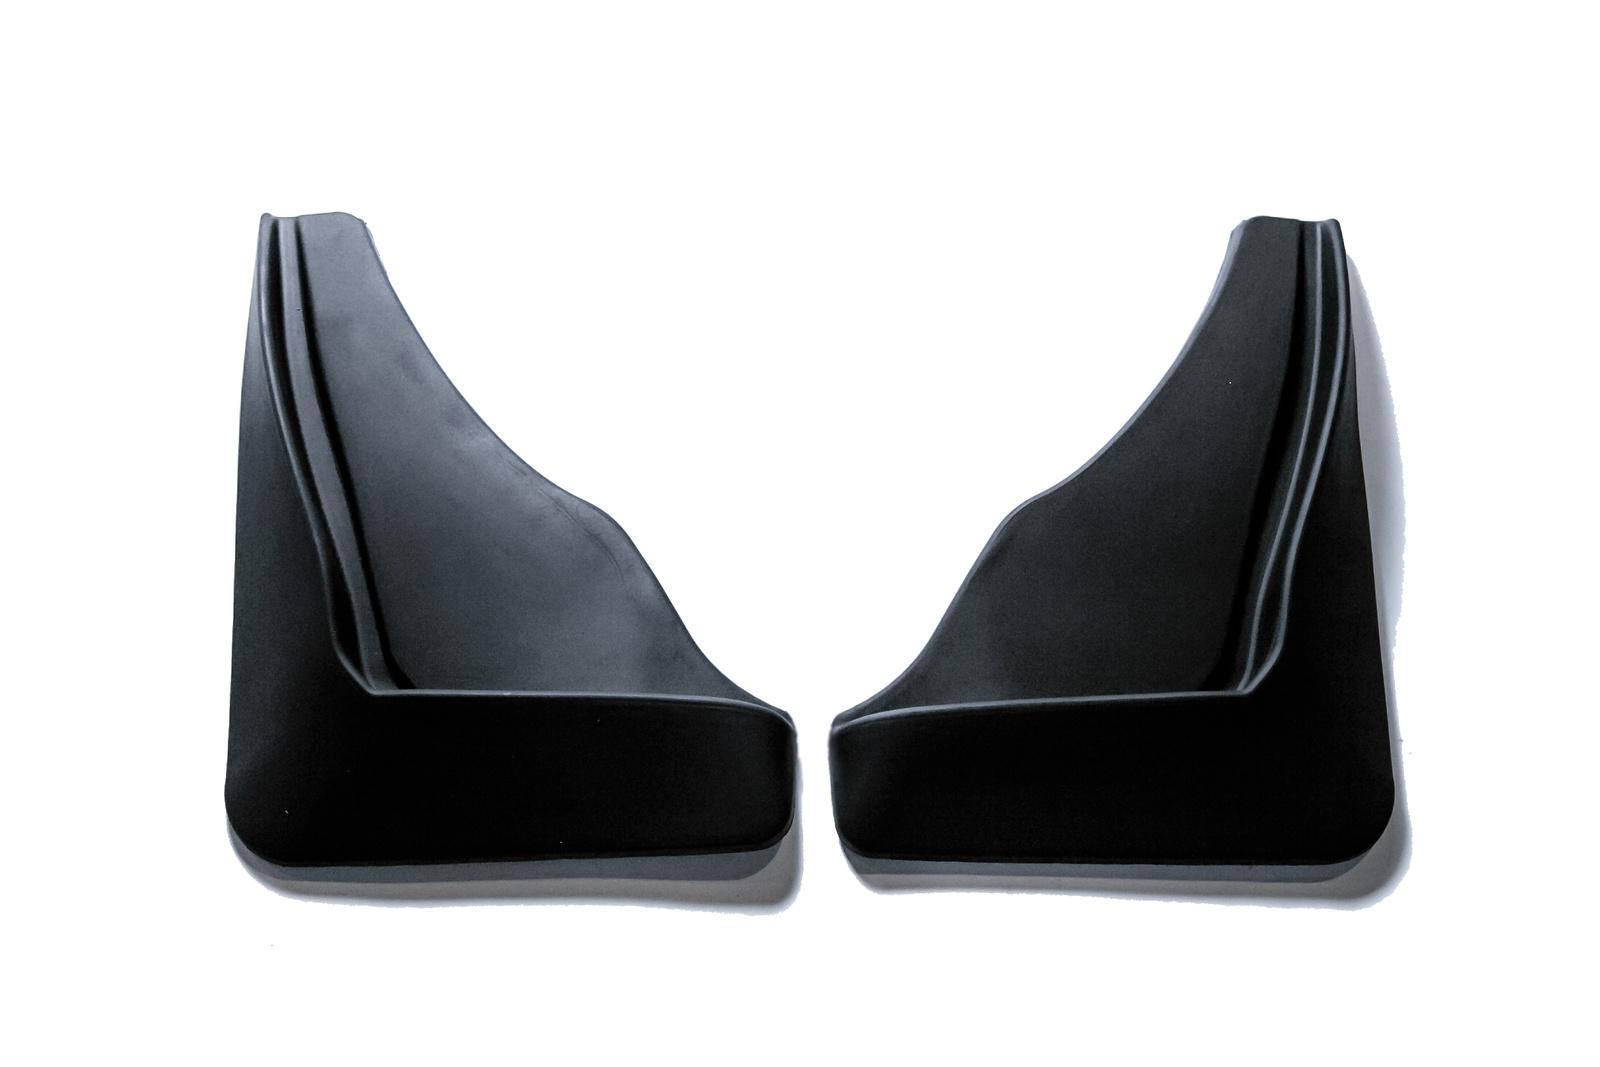 Брызговики резиновые для Toyota Camry (XV70) (2017-) Задние спойлер крышки багажника rival для toyota camry xv70 2018 н в под покраску abs пластик o 5705 001